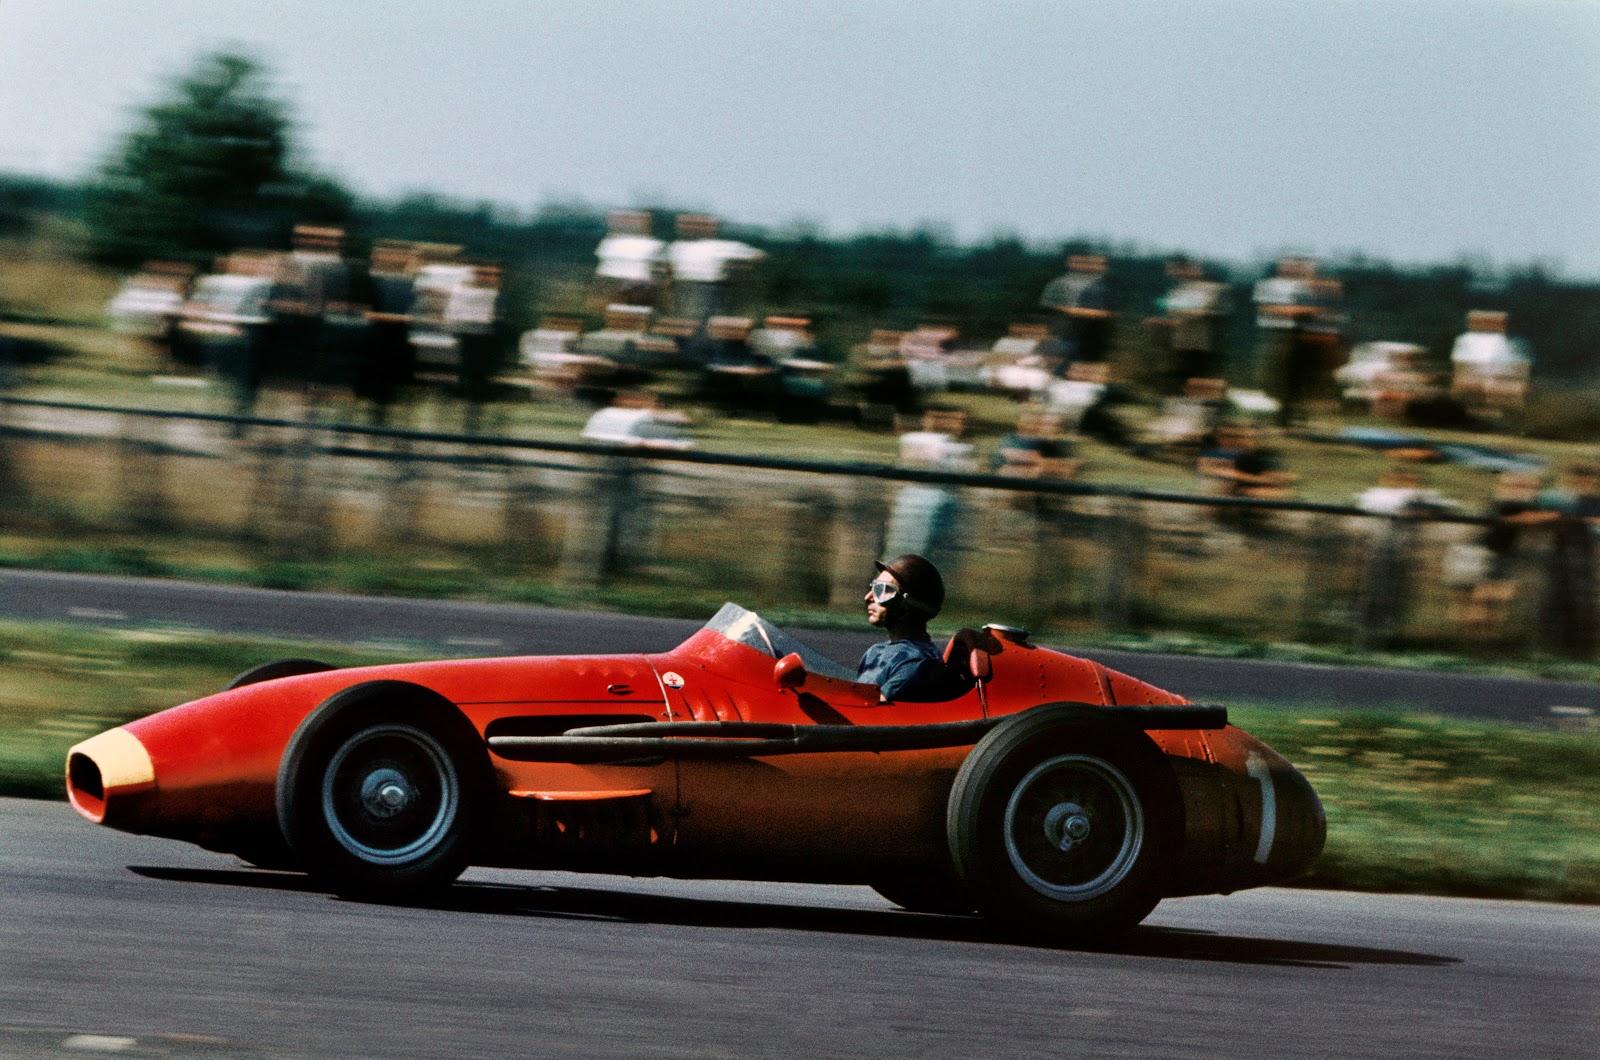 club5a sport auto grand prix d 39 allemagne de 1957 ternel manuel. Black Bedroom Furniture Sets. Home Design Ideas